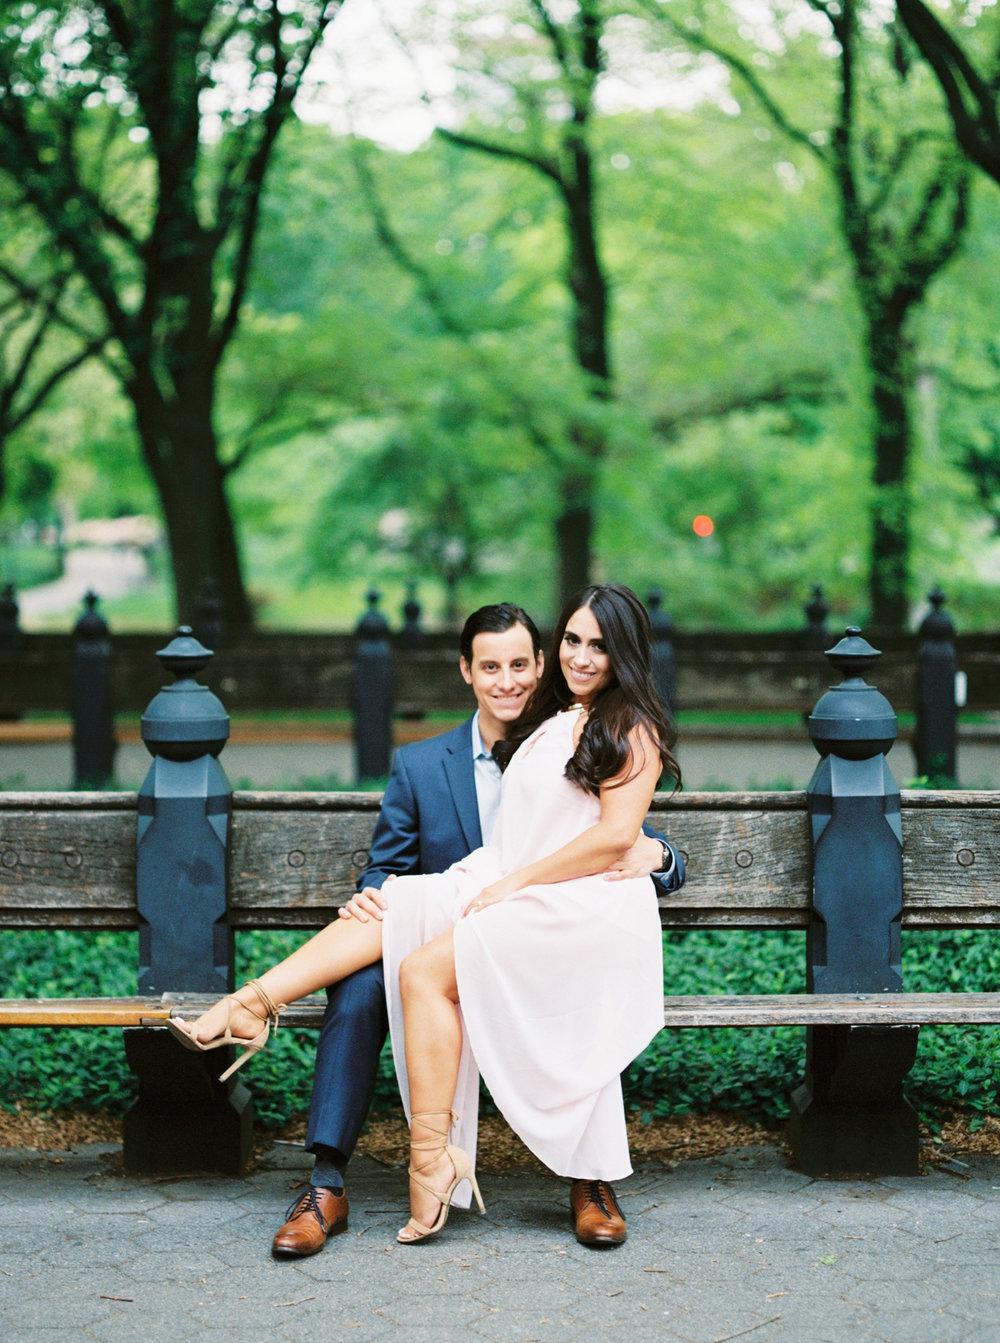 NewYork_CentralPark_Engagement_DennisRoyCoronel-52.jpg